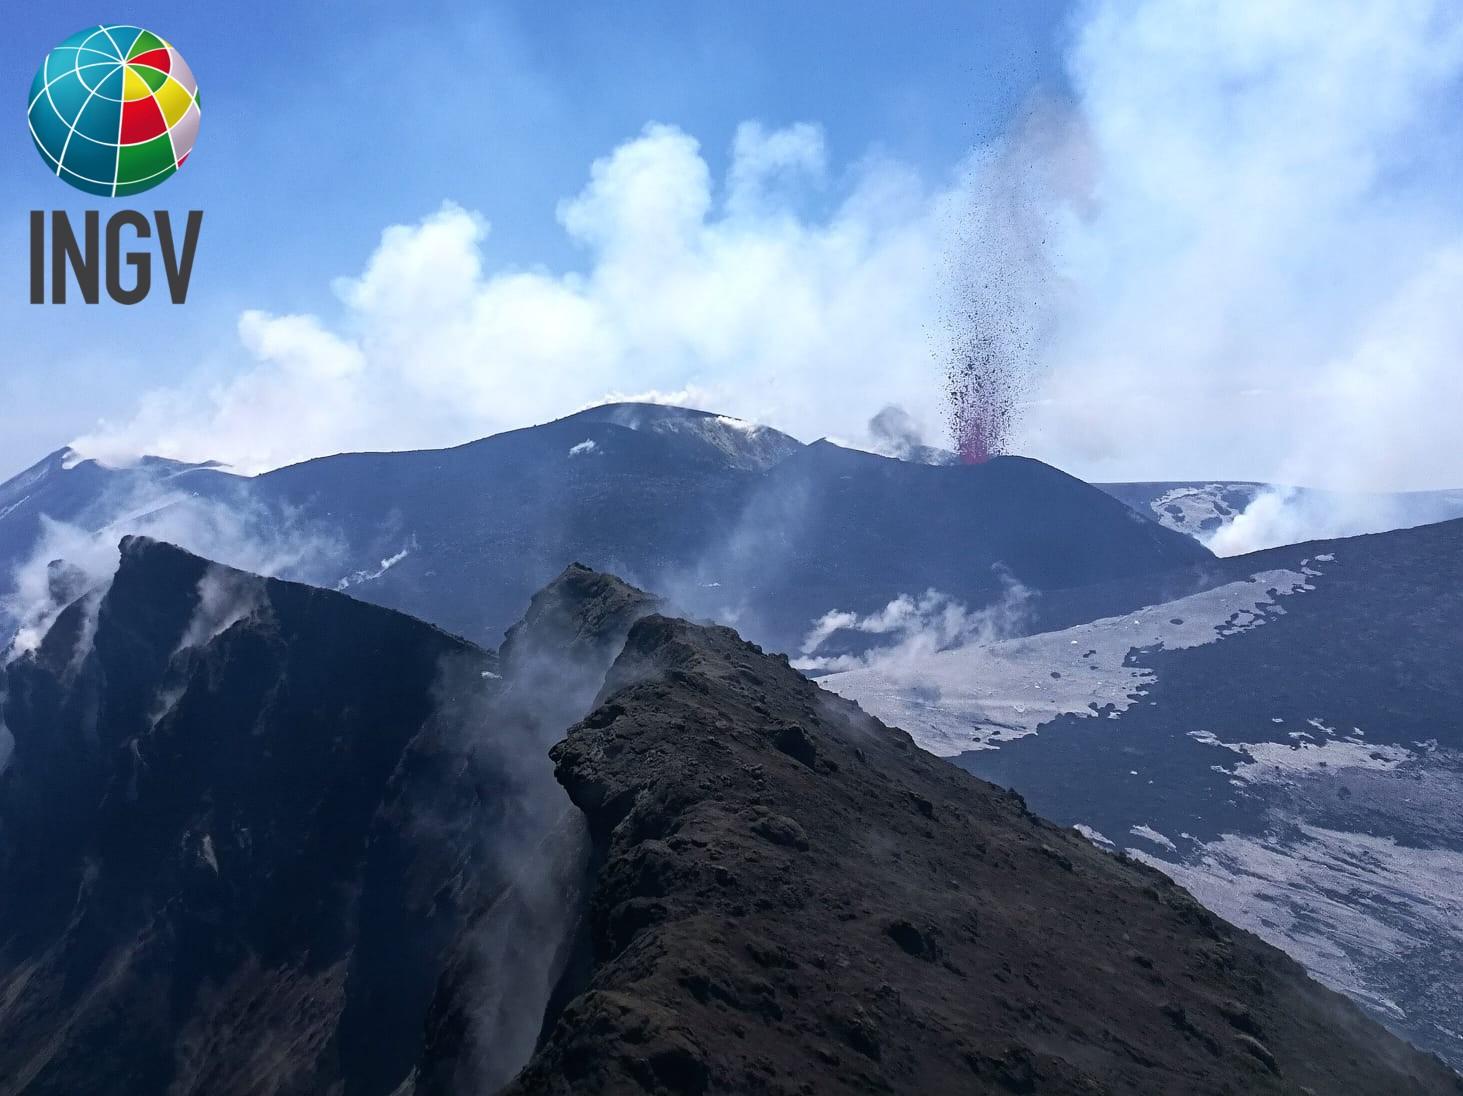 15 Avril 2020.  FR . La Réunion : Piton de la Fournaise , Italie / Sicile : Etna , Italie : Stromboli , Pérou : Ubinas , Indonésie : Lokon .